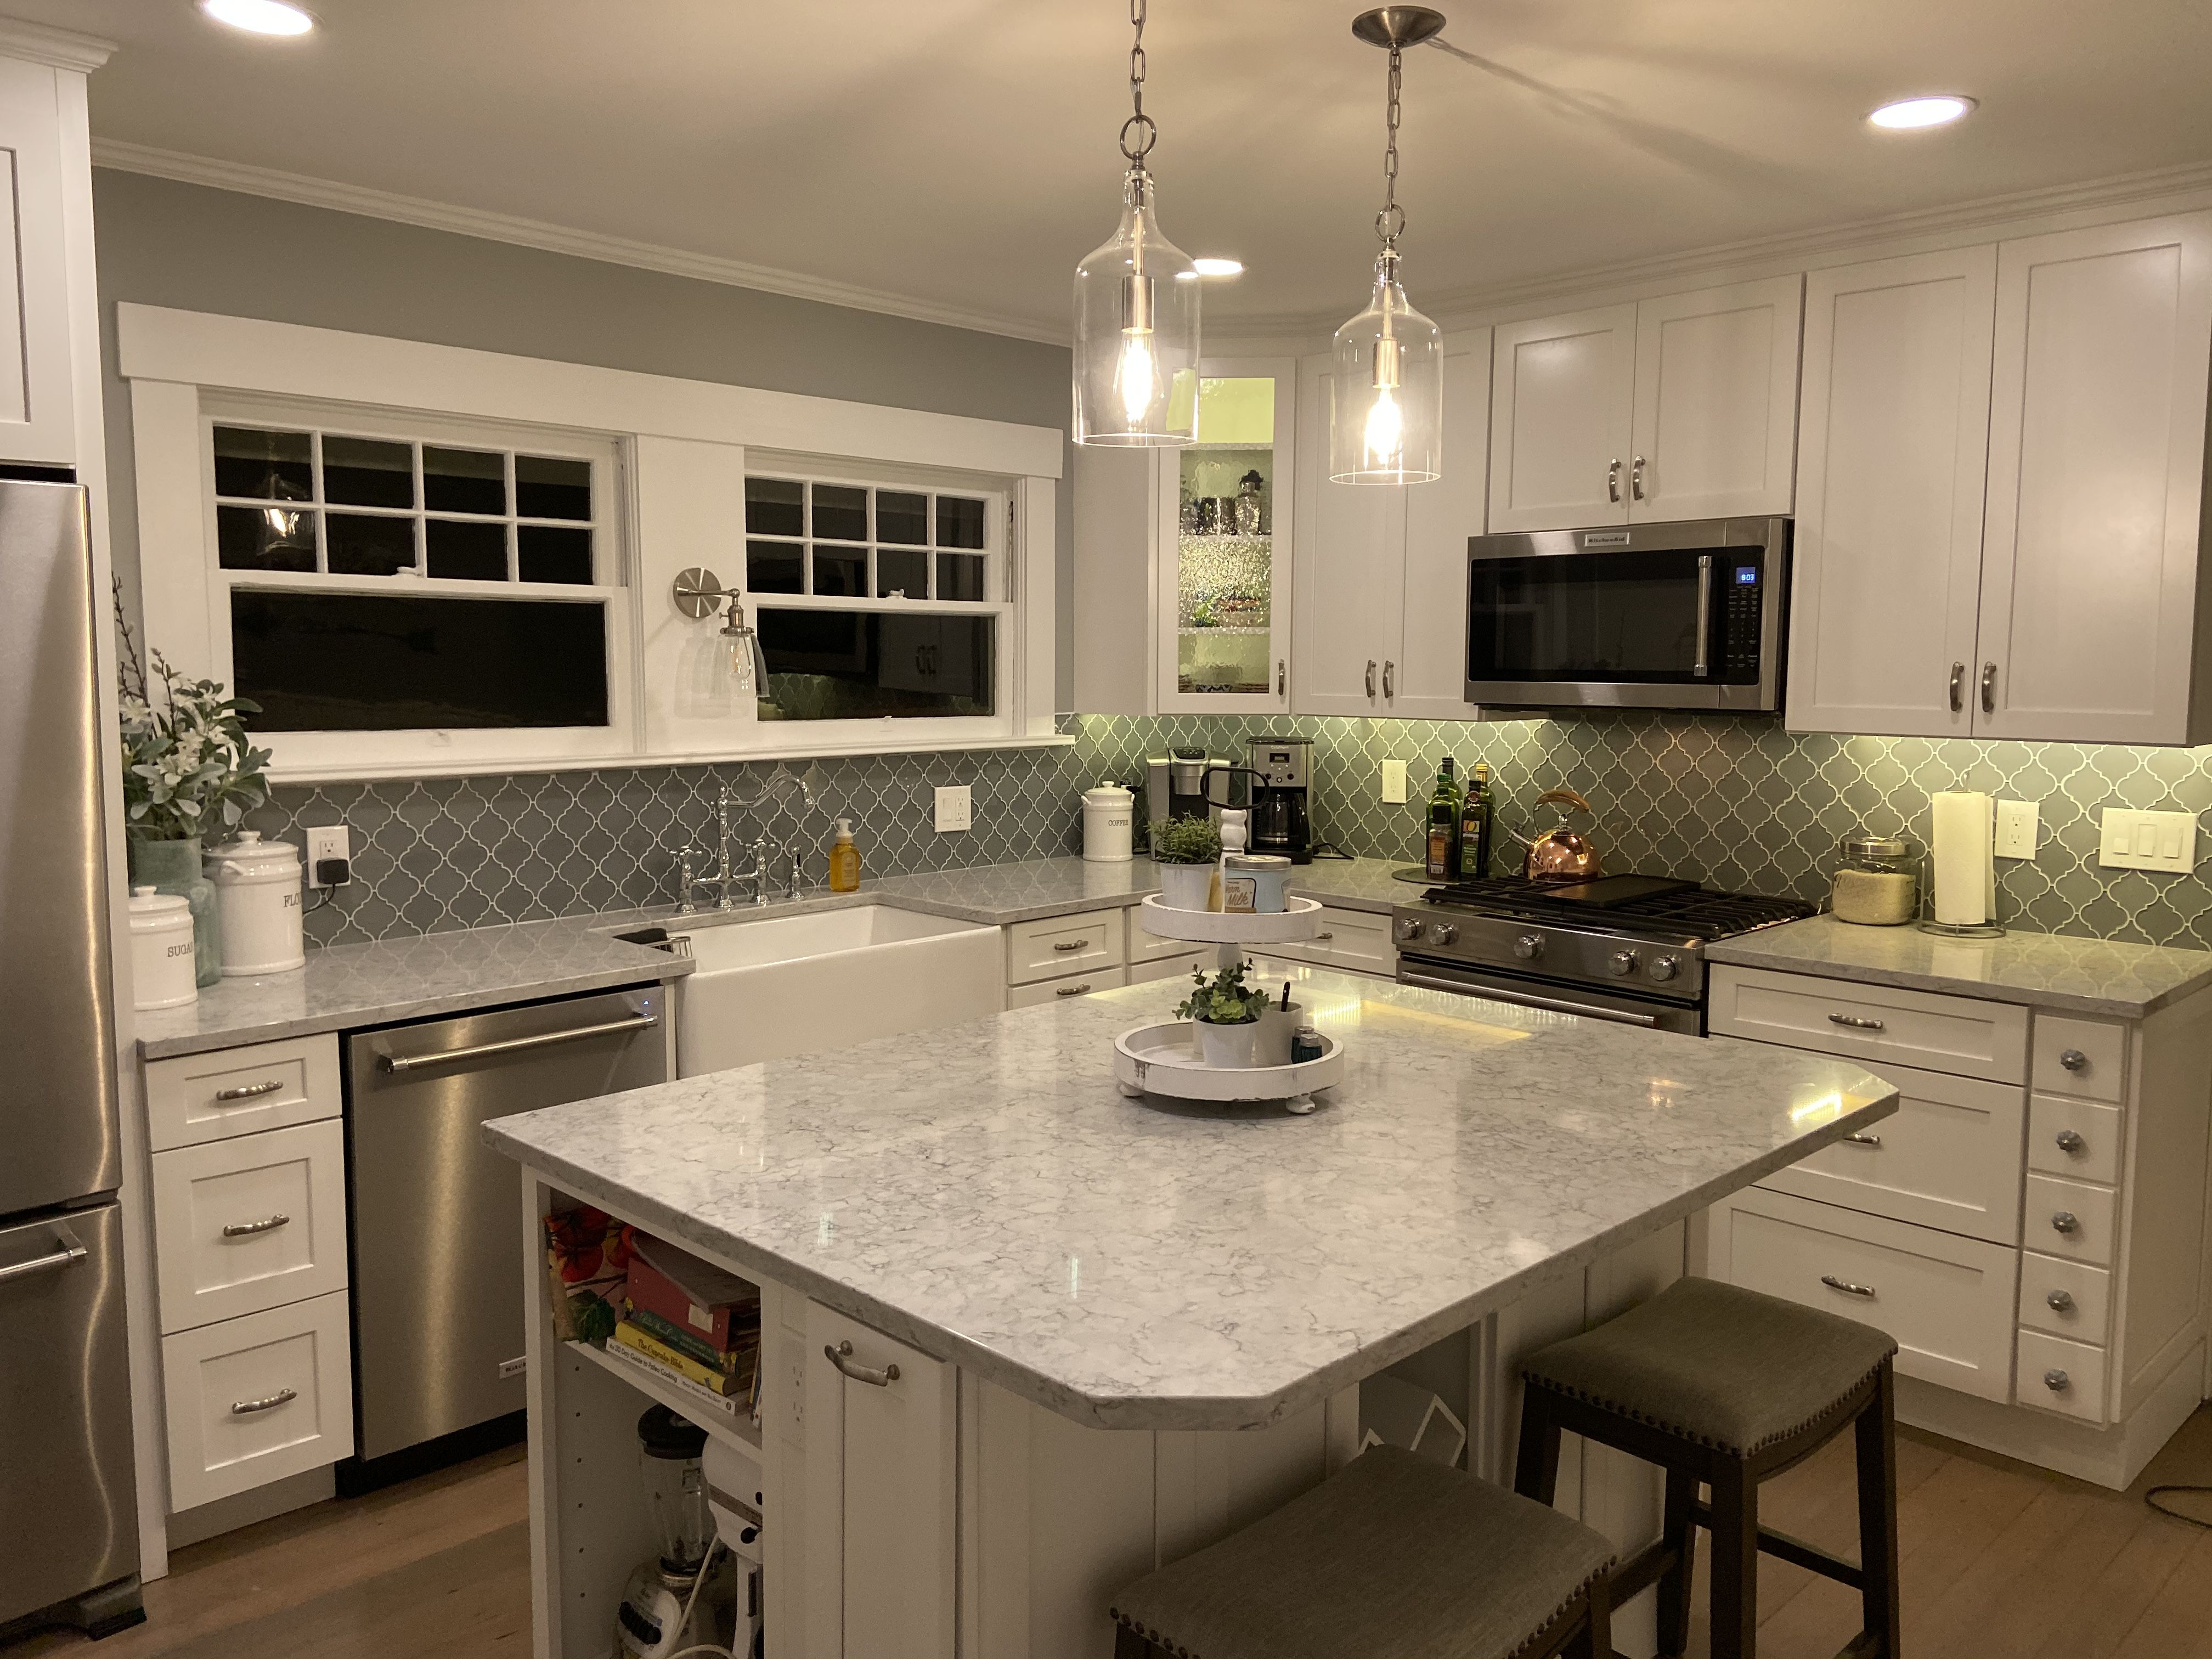 Quartz counter, white shaker cabinets, glass pendant ...